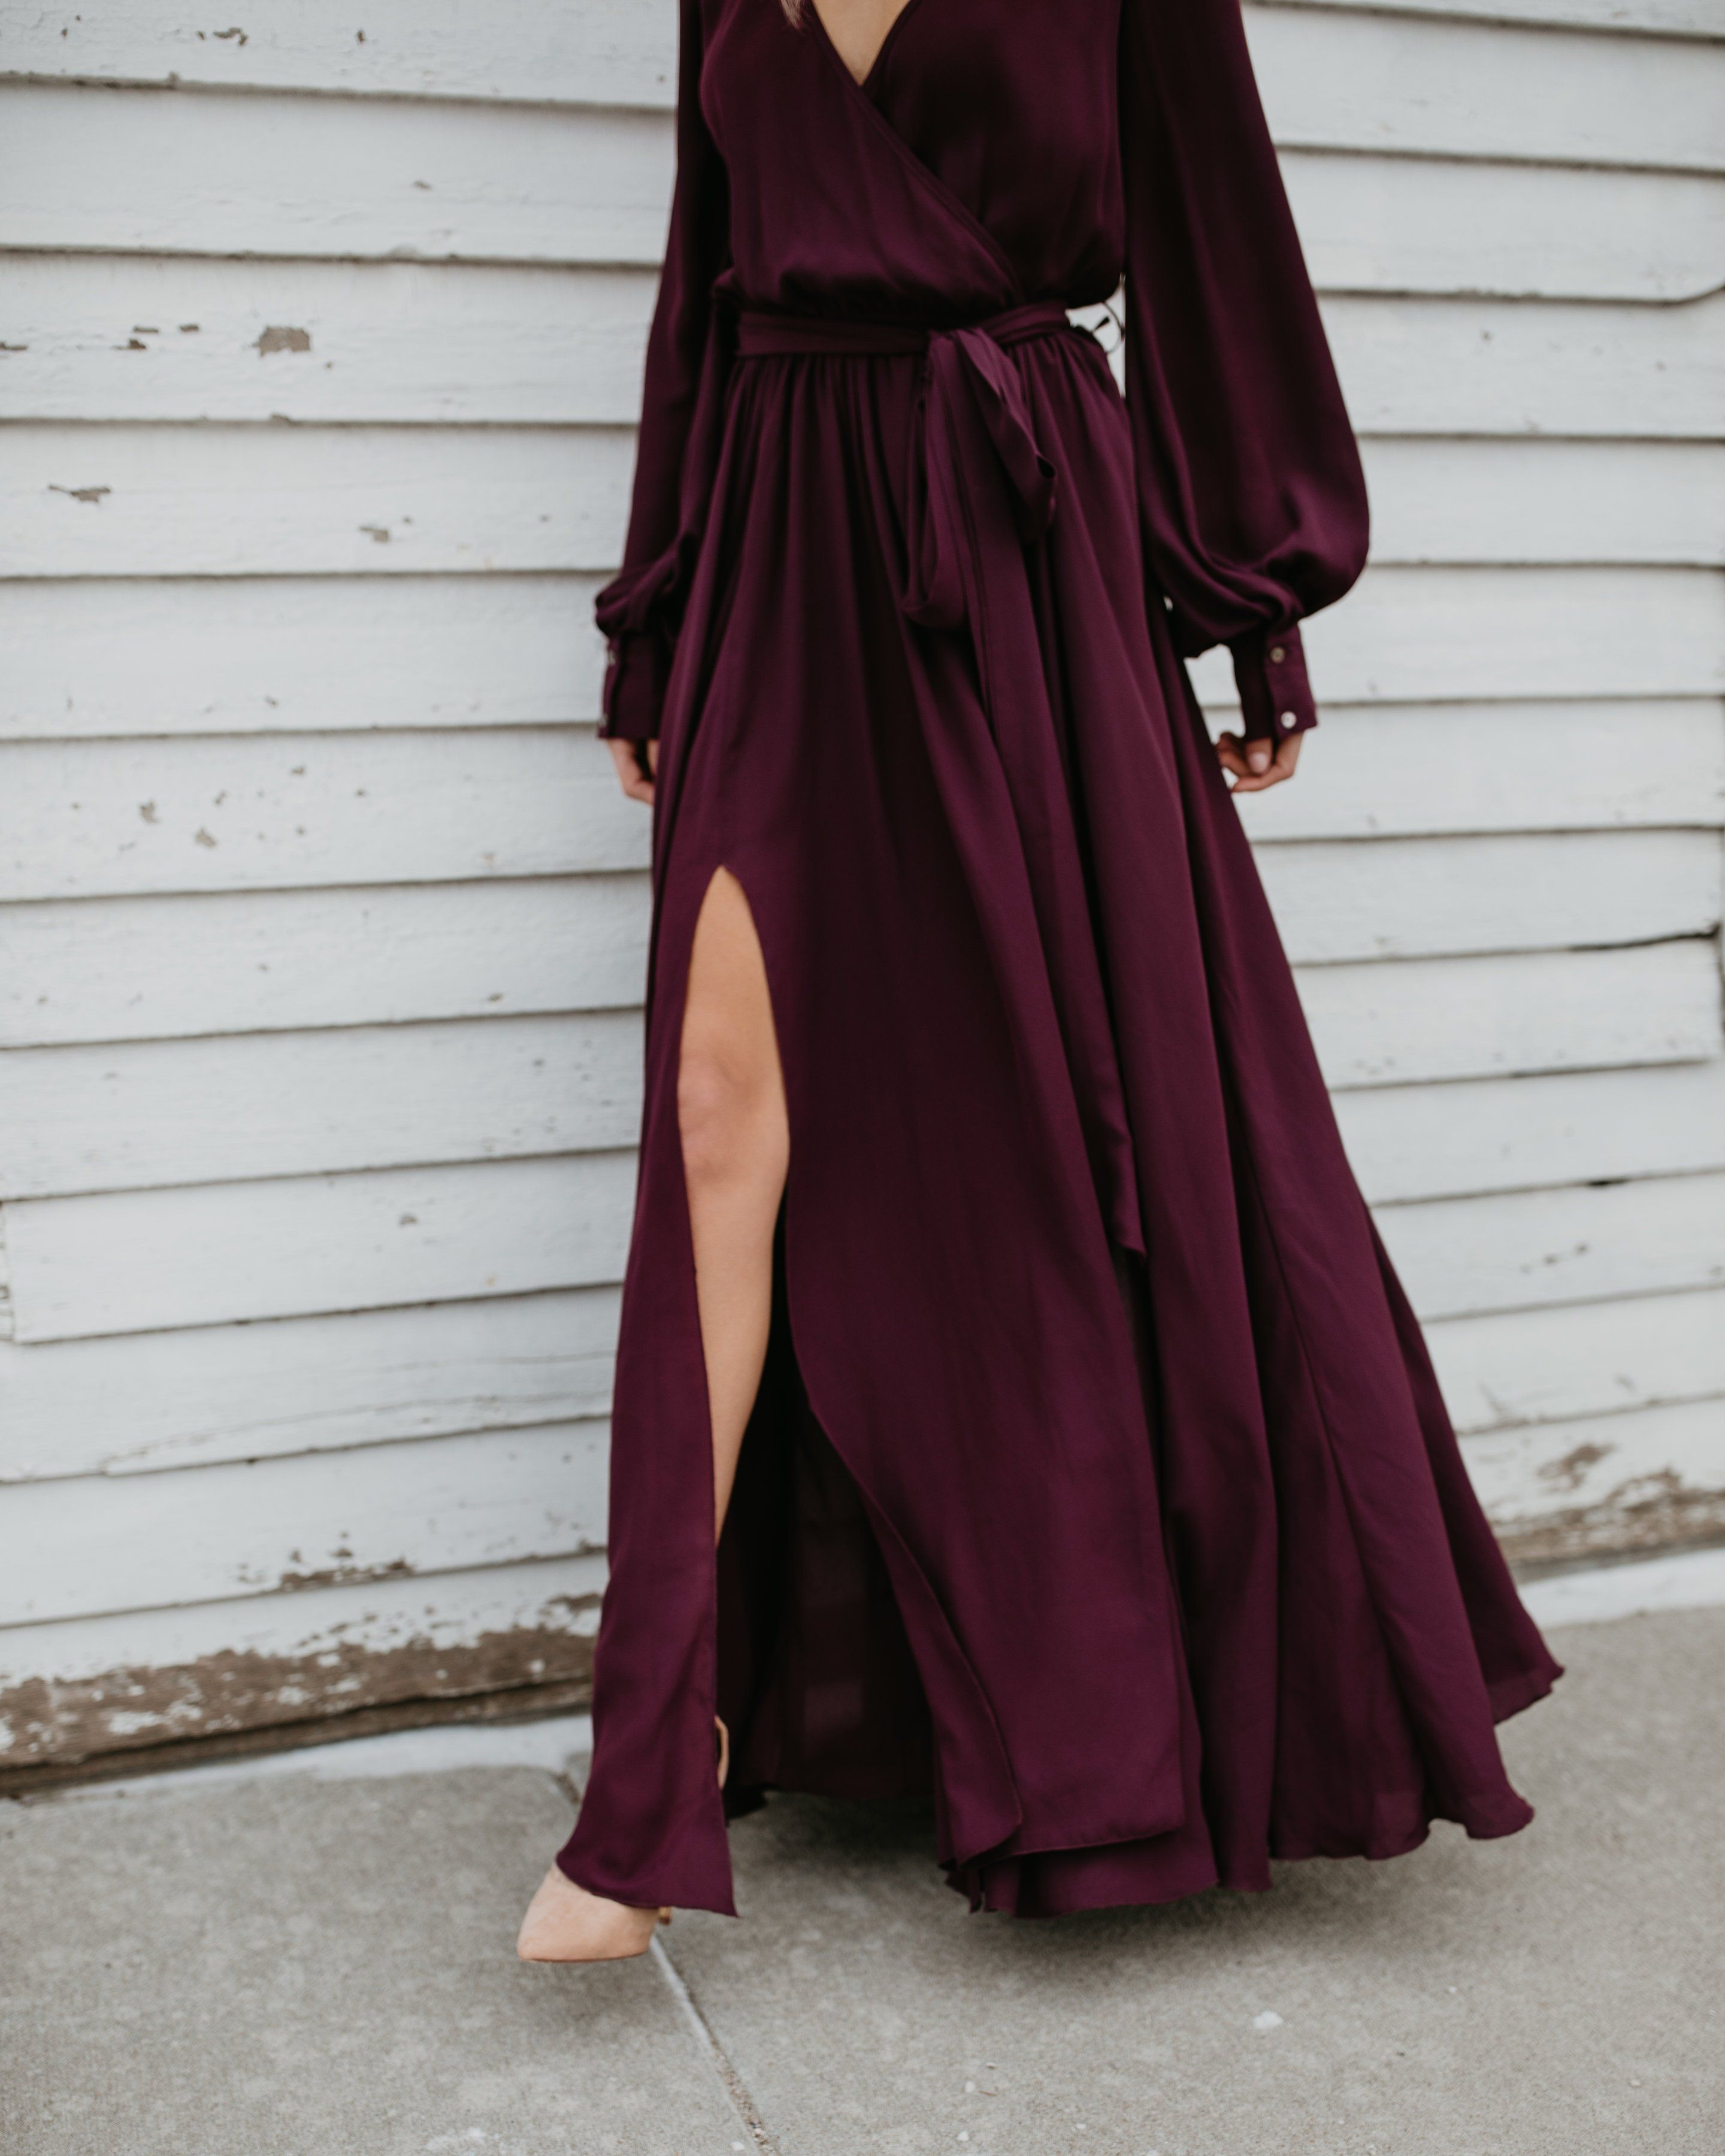 Long Sleeve Diana Maxi Dress Wine Long Sleeve Flowy Dresses Flowy Dress Long Maroon Flowy Dress [ 3600 x 2880 Pixel ]